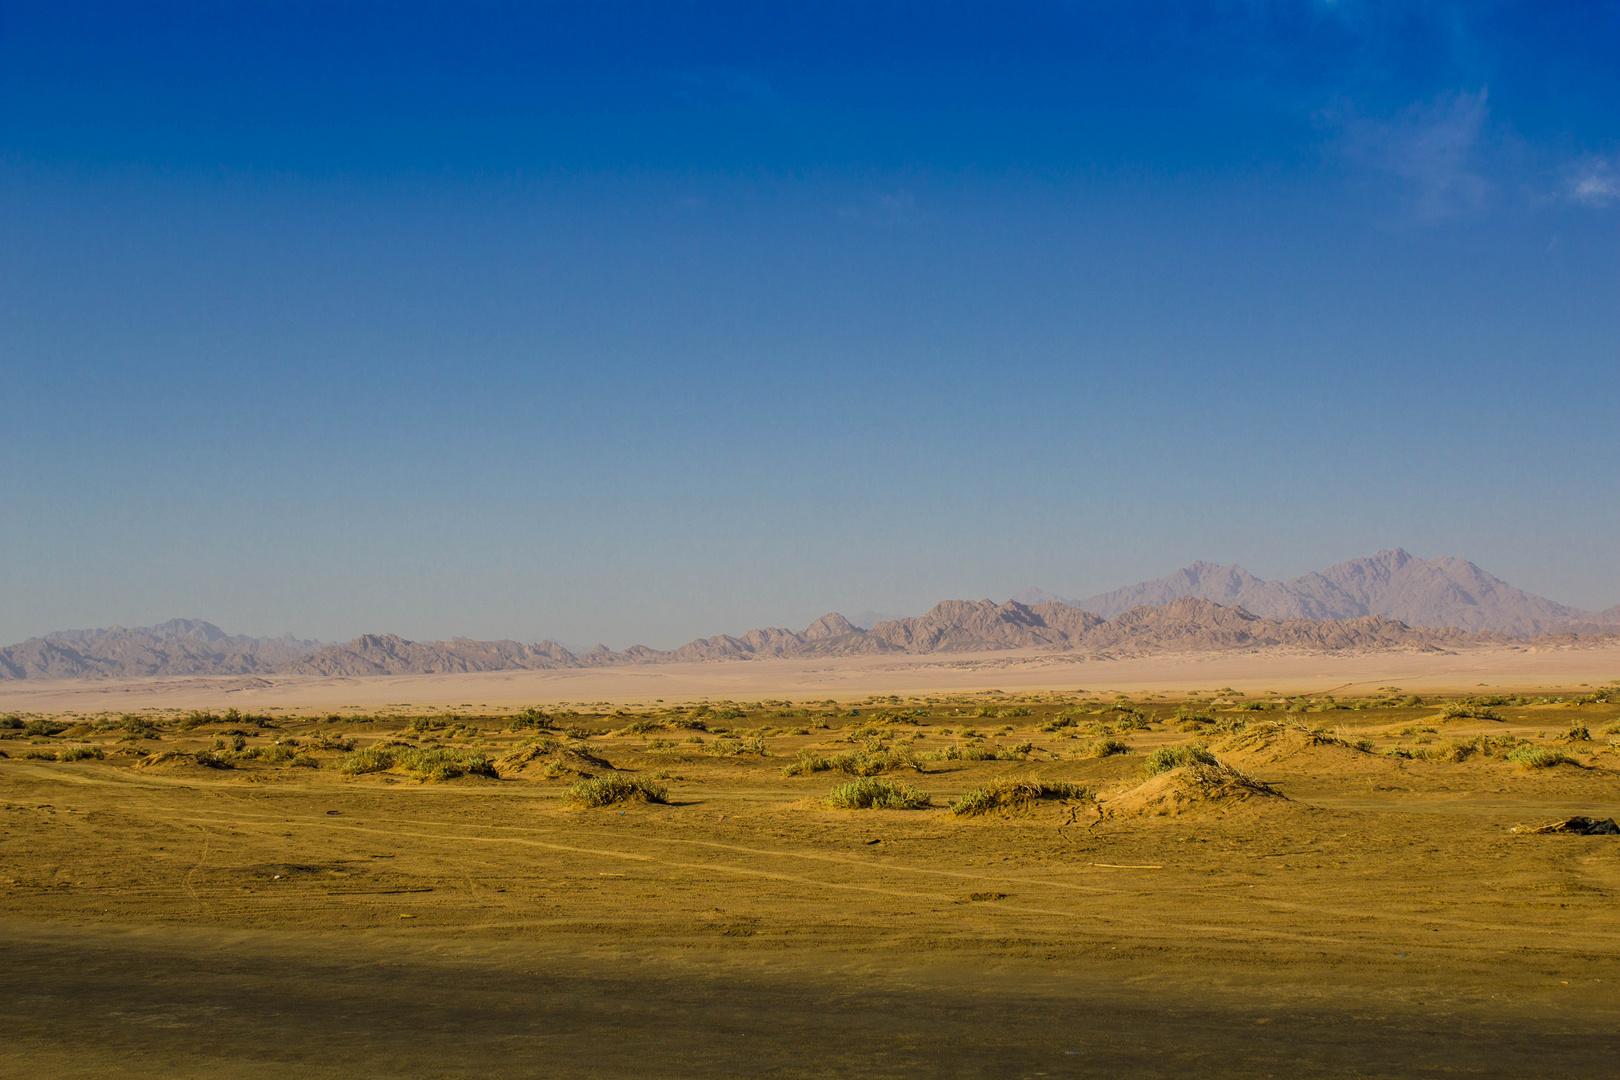 Sinai Deserts